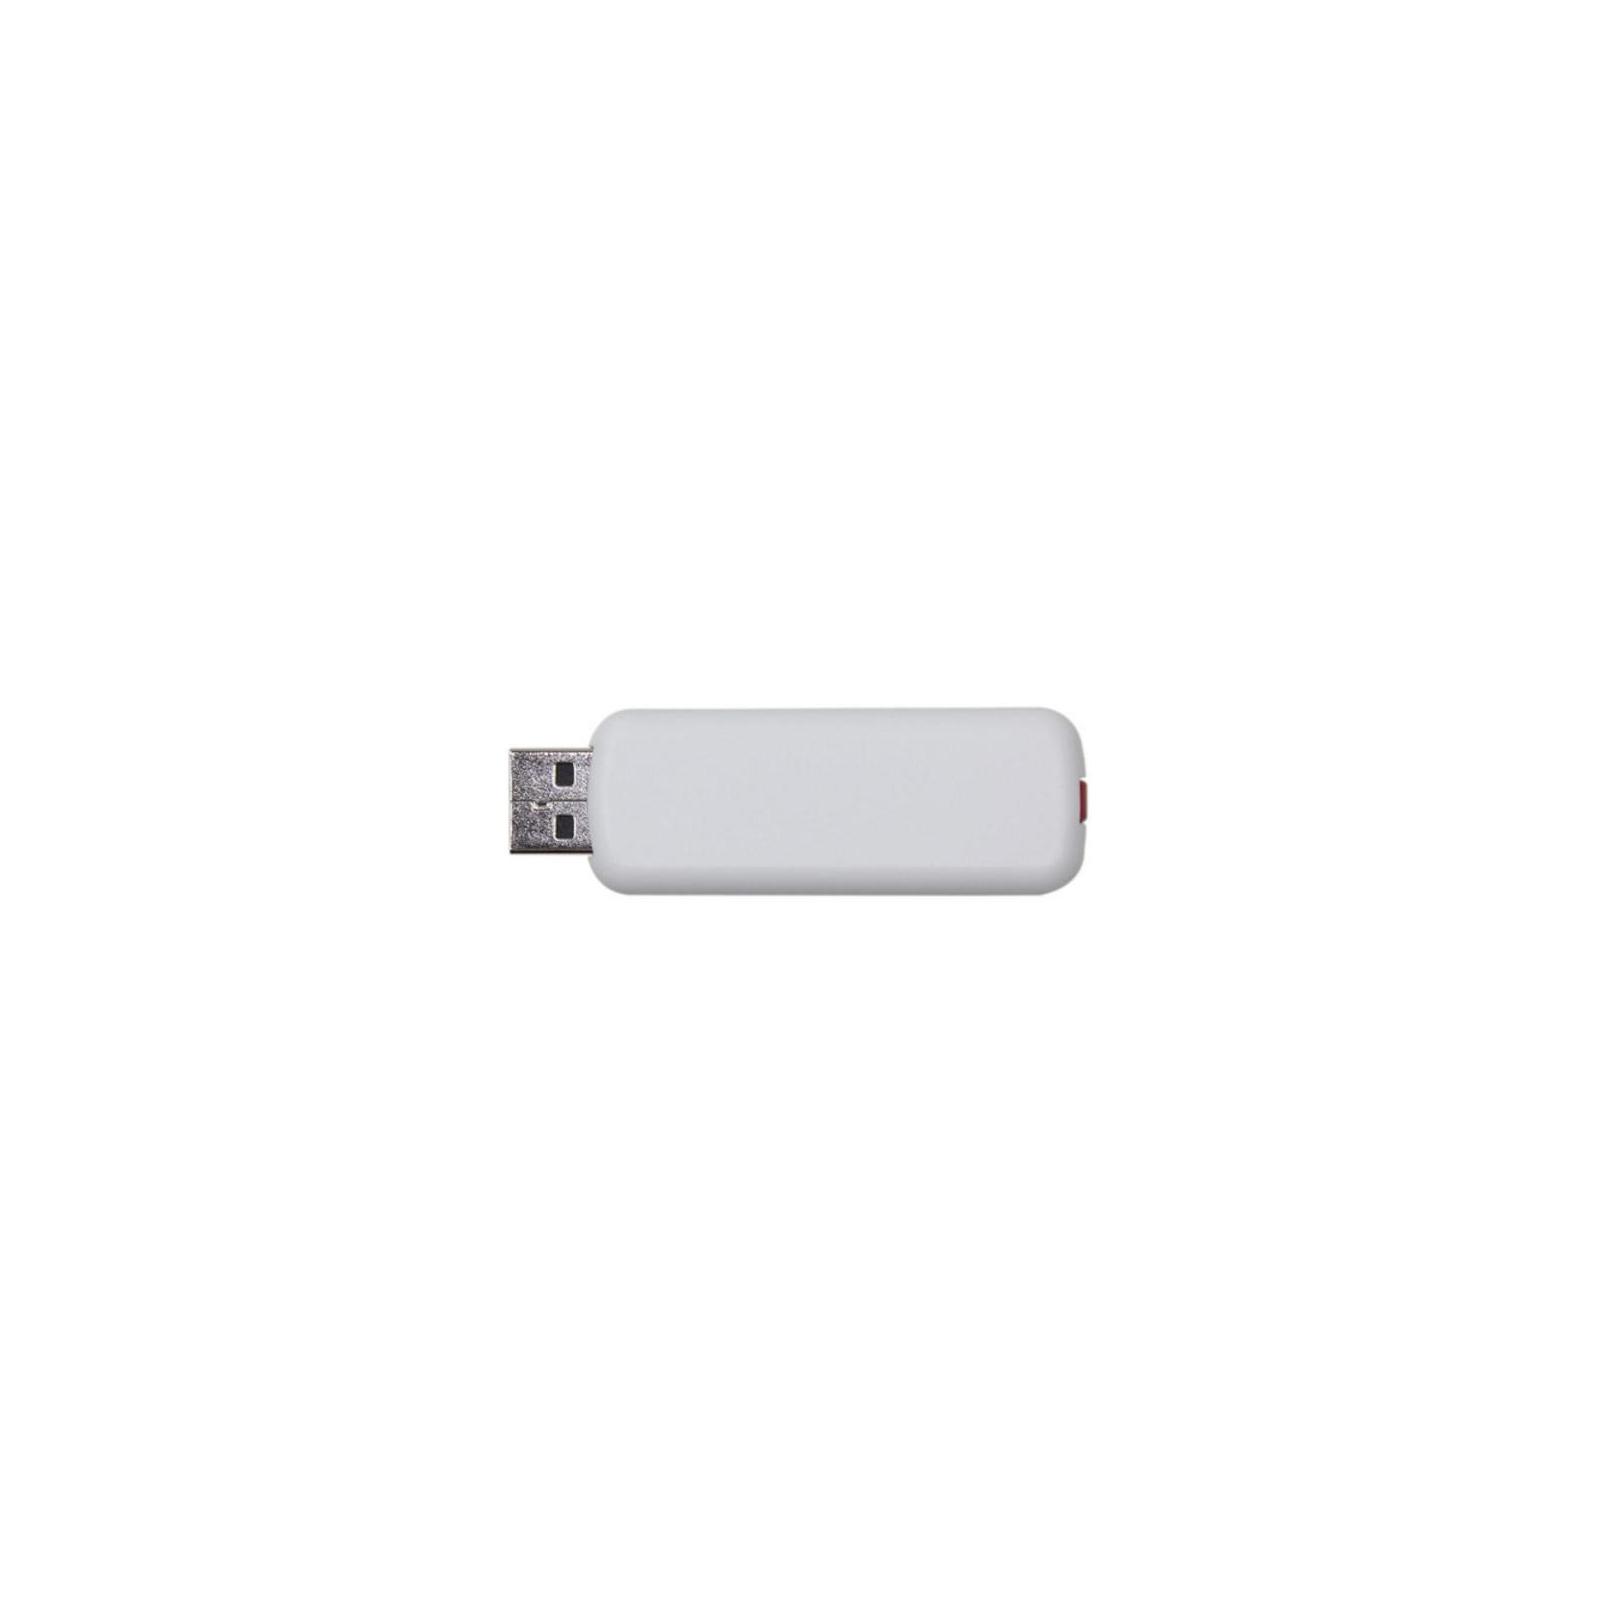 USB флеш накопитель Handy Steno AH326 white Apacer (AP8GAH326W-1) изображение 2